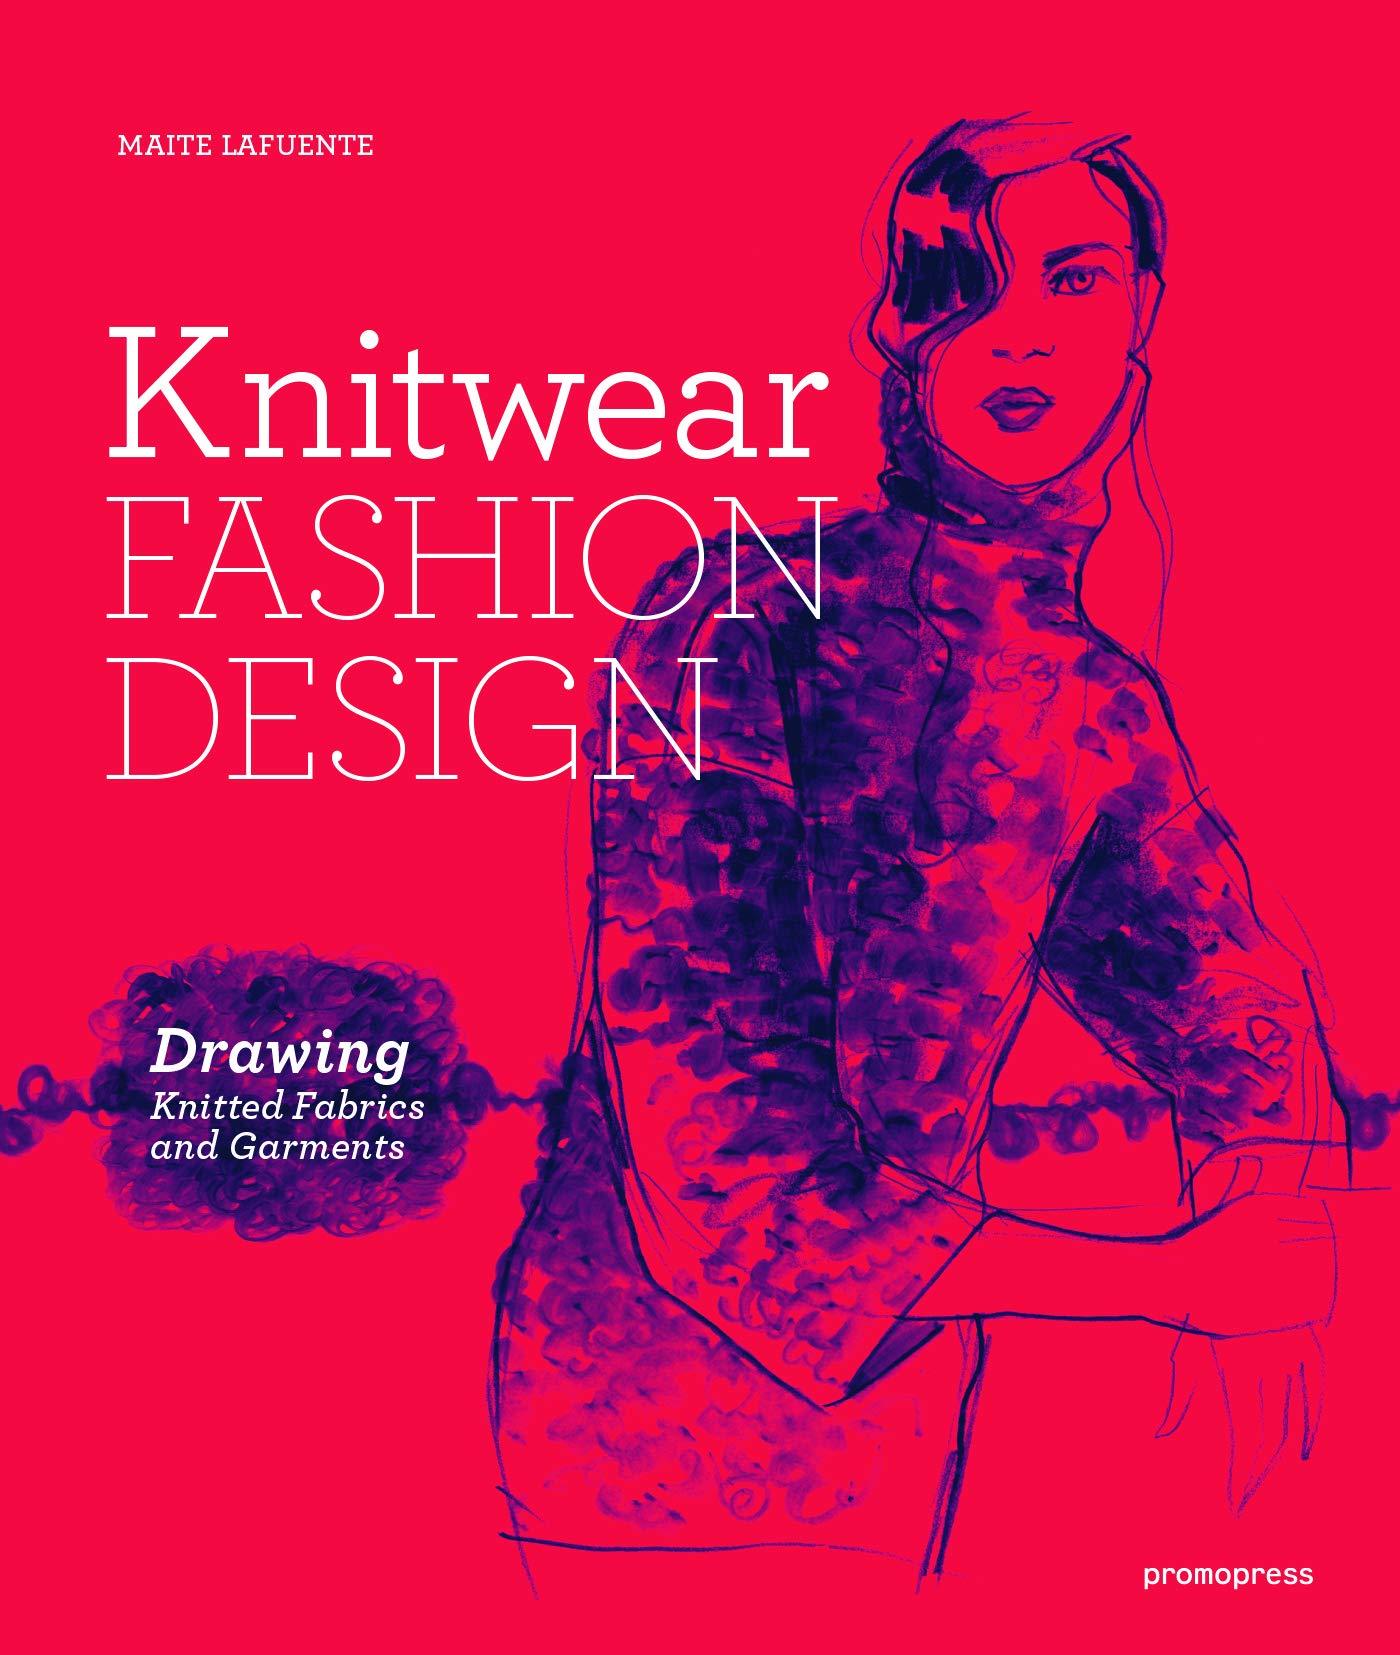 Knitwear Fashion Design The Secrets Of Drawing Knitted Fabrics And Garments Mode Bijoux Lafuente Maite Solanilla Charo Mora 9788416851171 Amazon Com Books